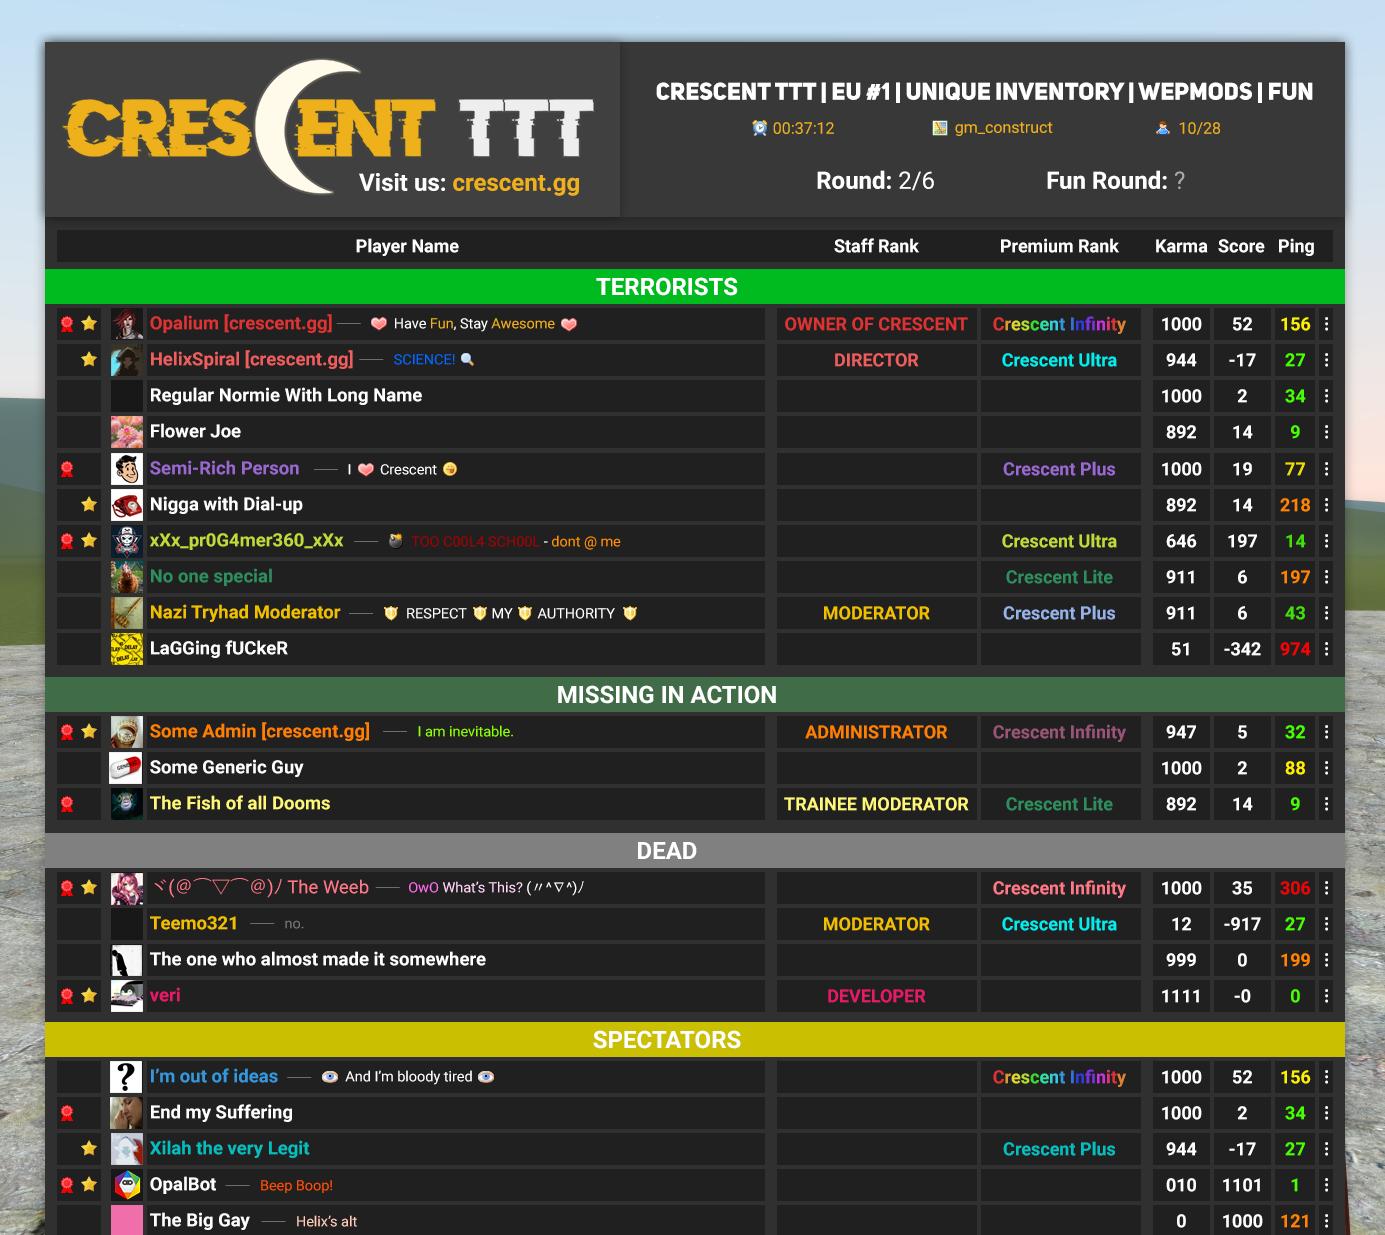 Scoreboard_v2_hmpf.png